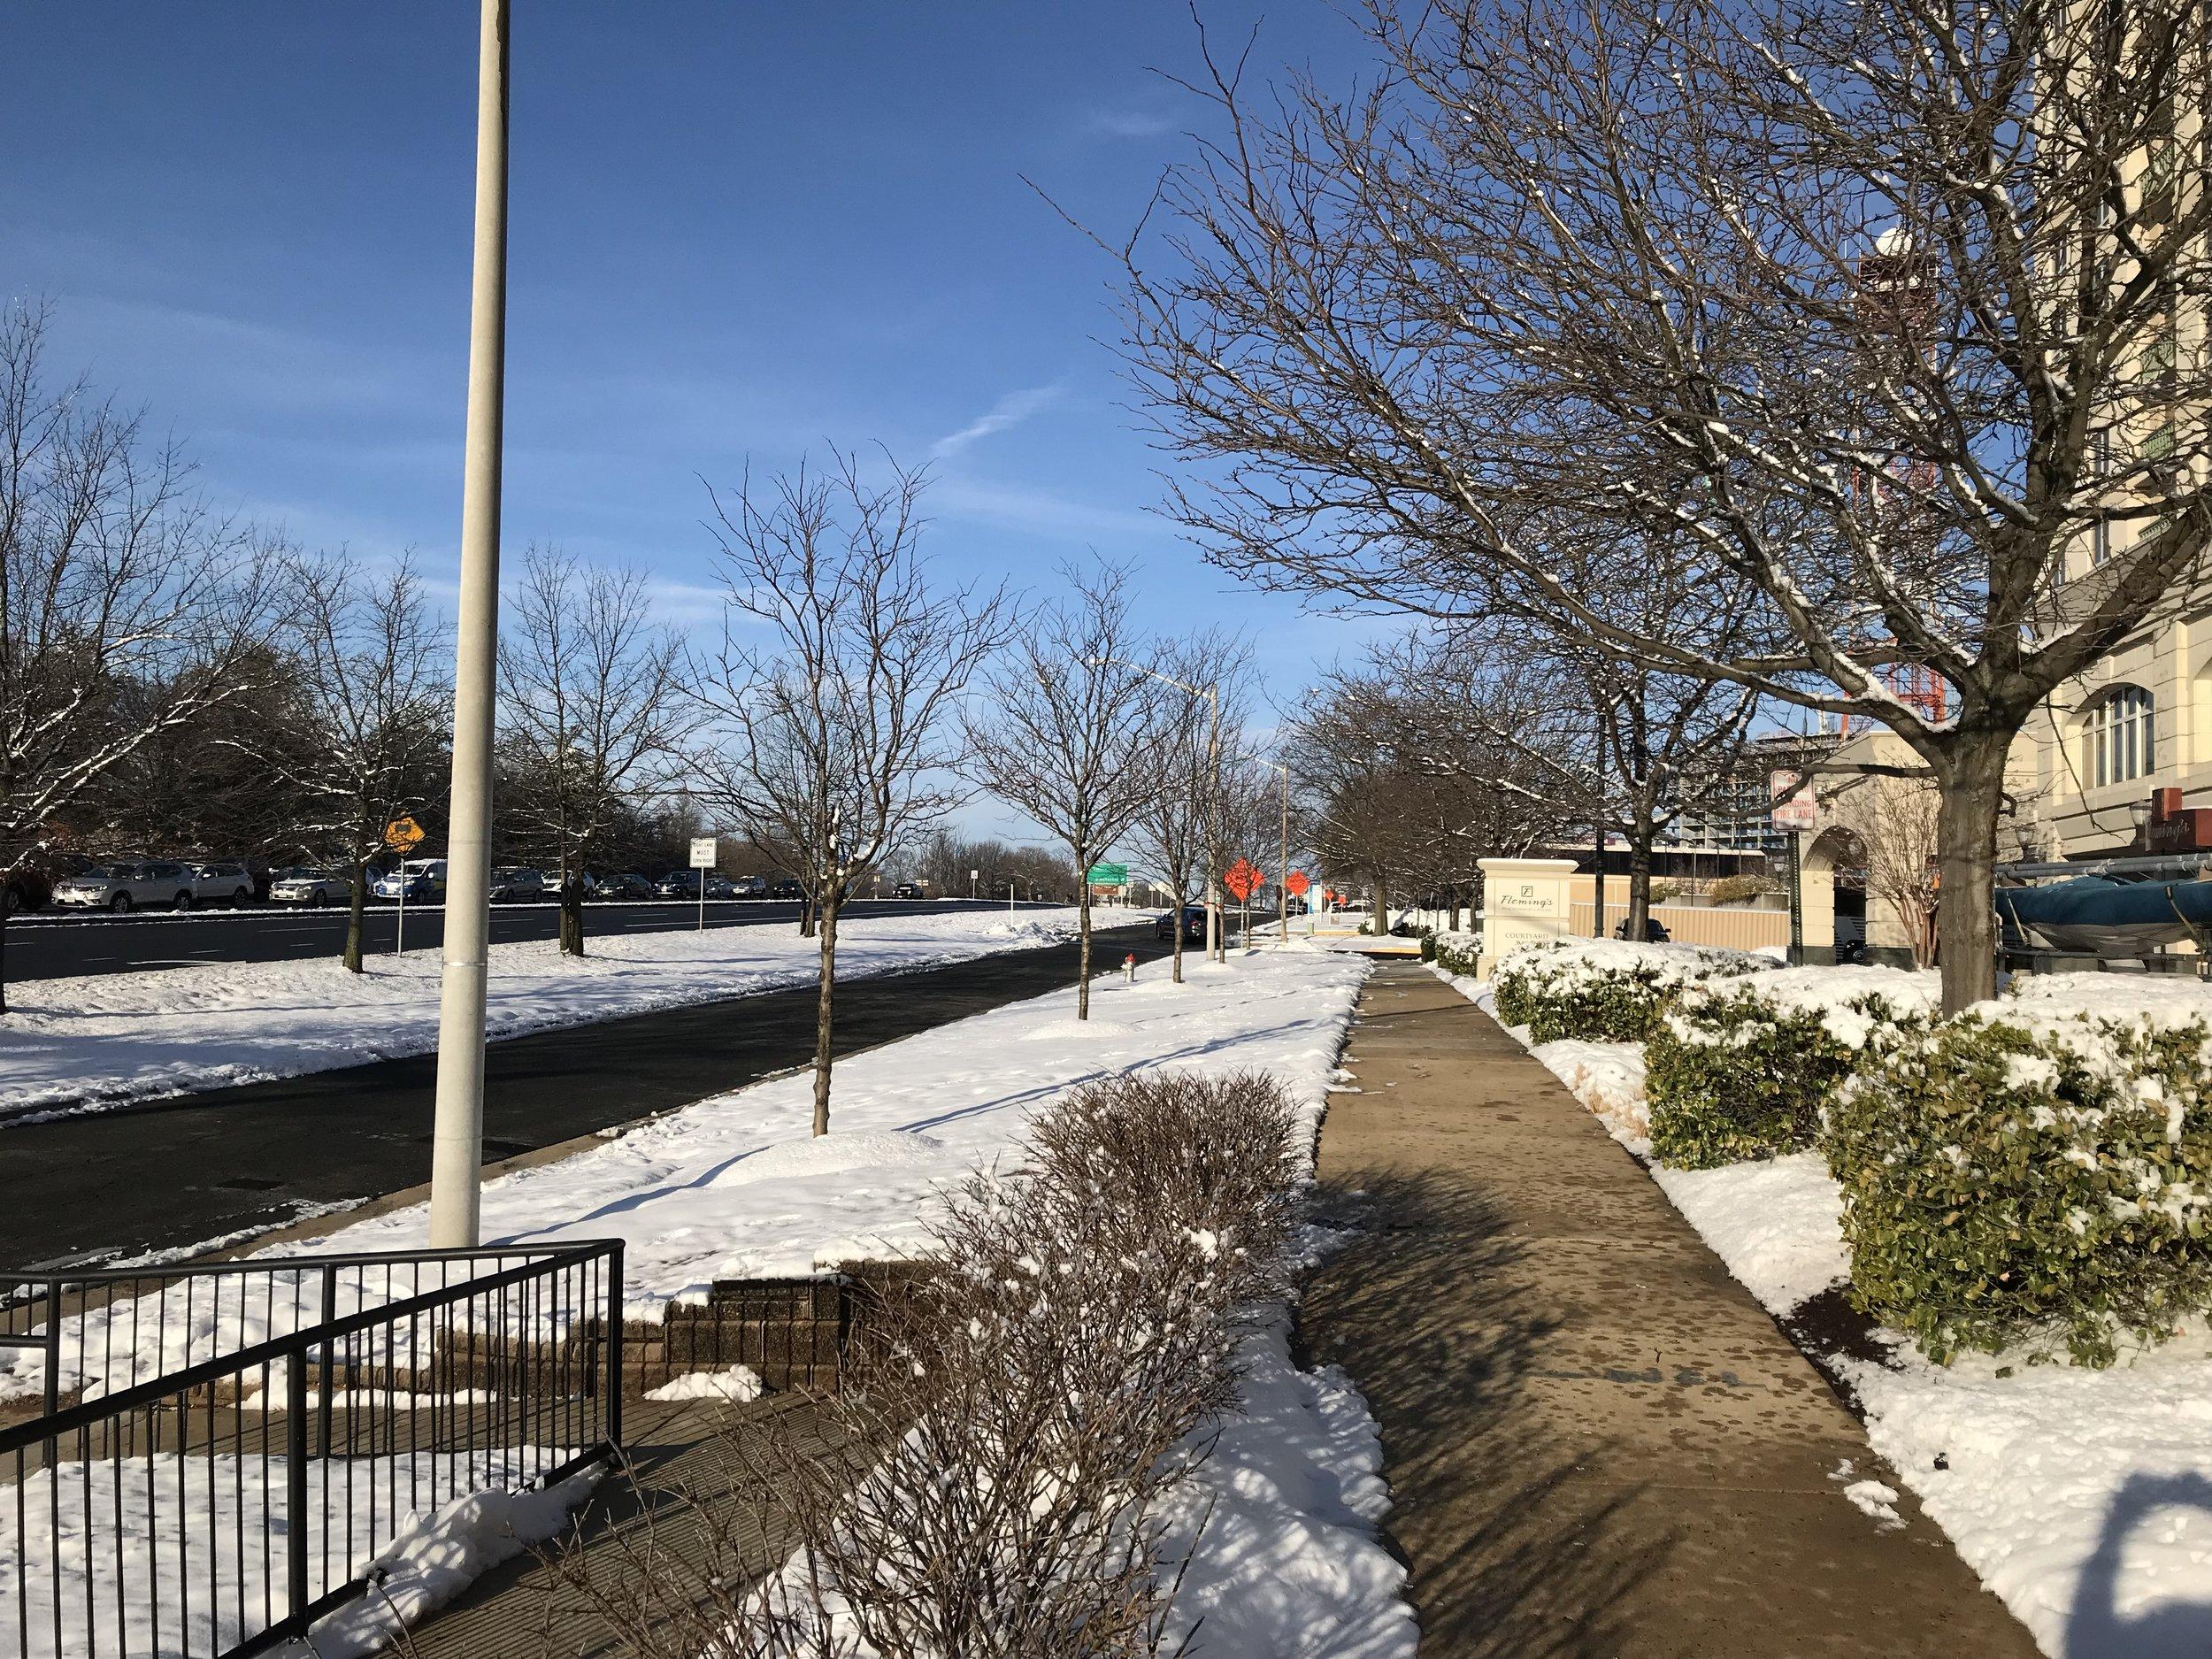 Snow in McLean, VA